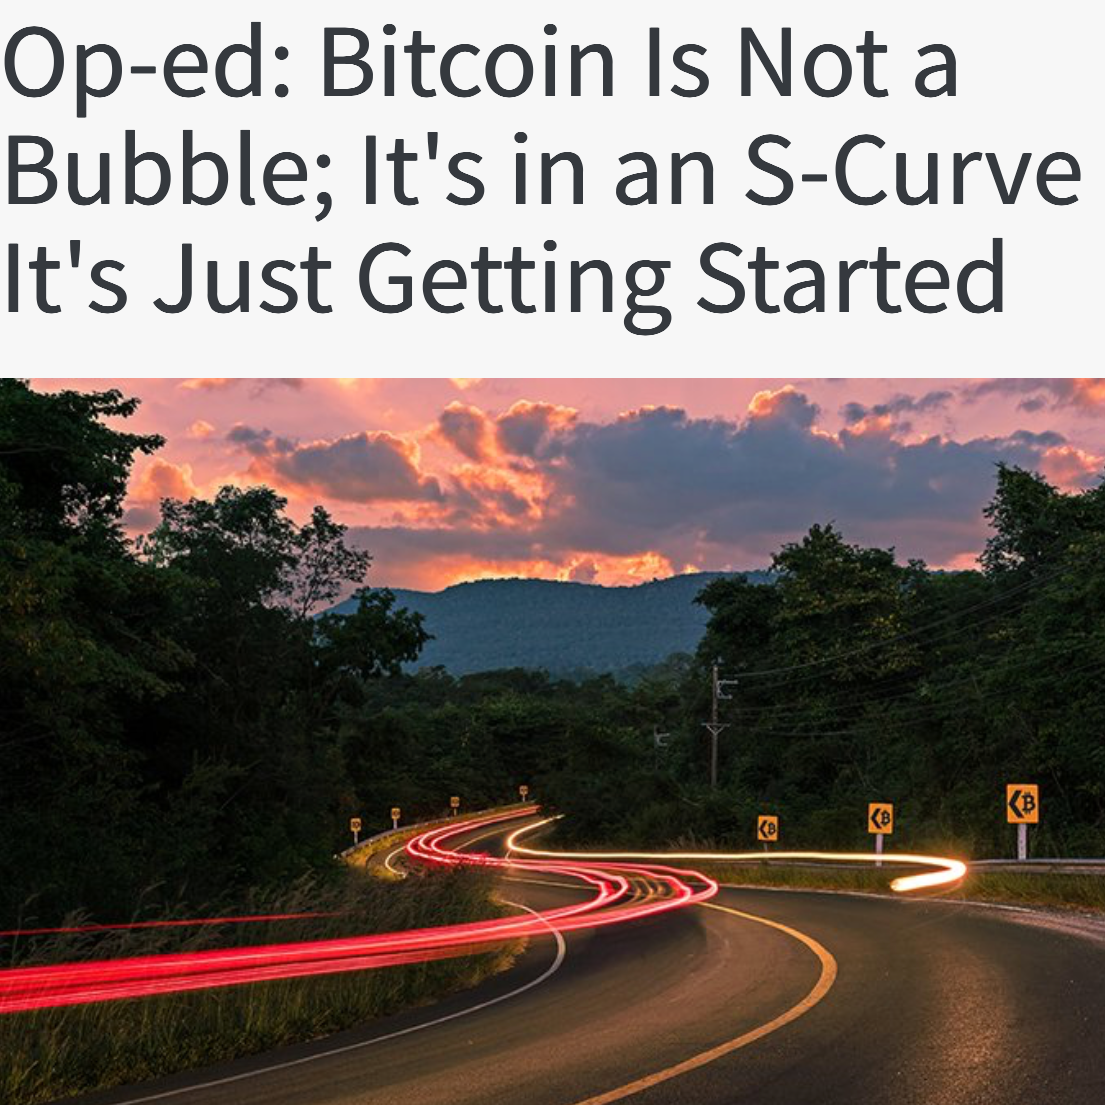 Bubble or S curve?